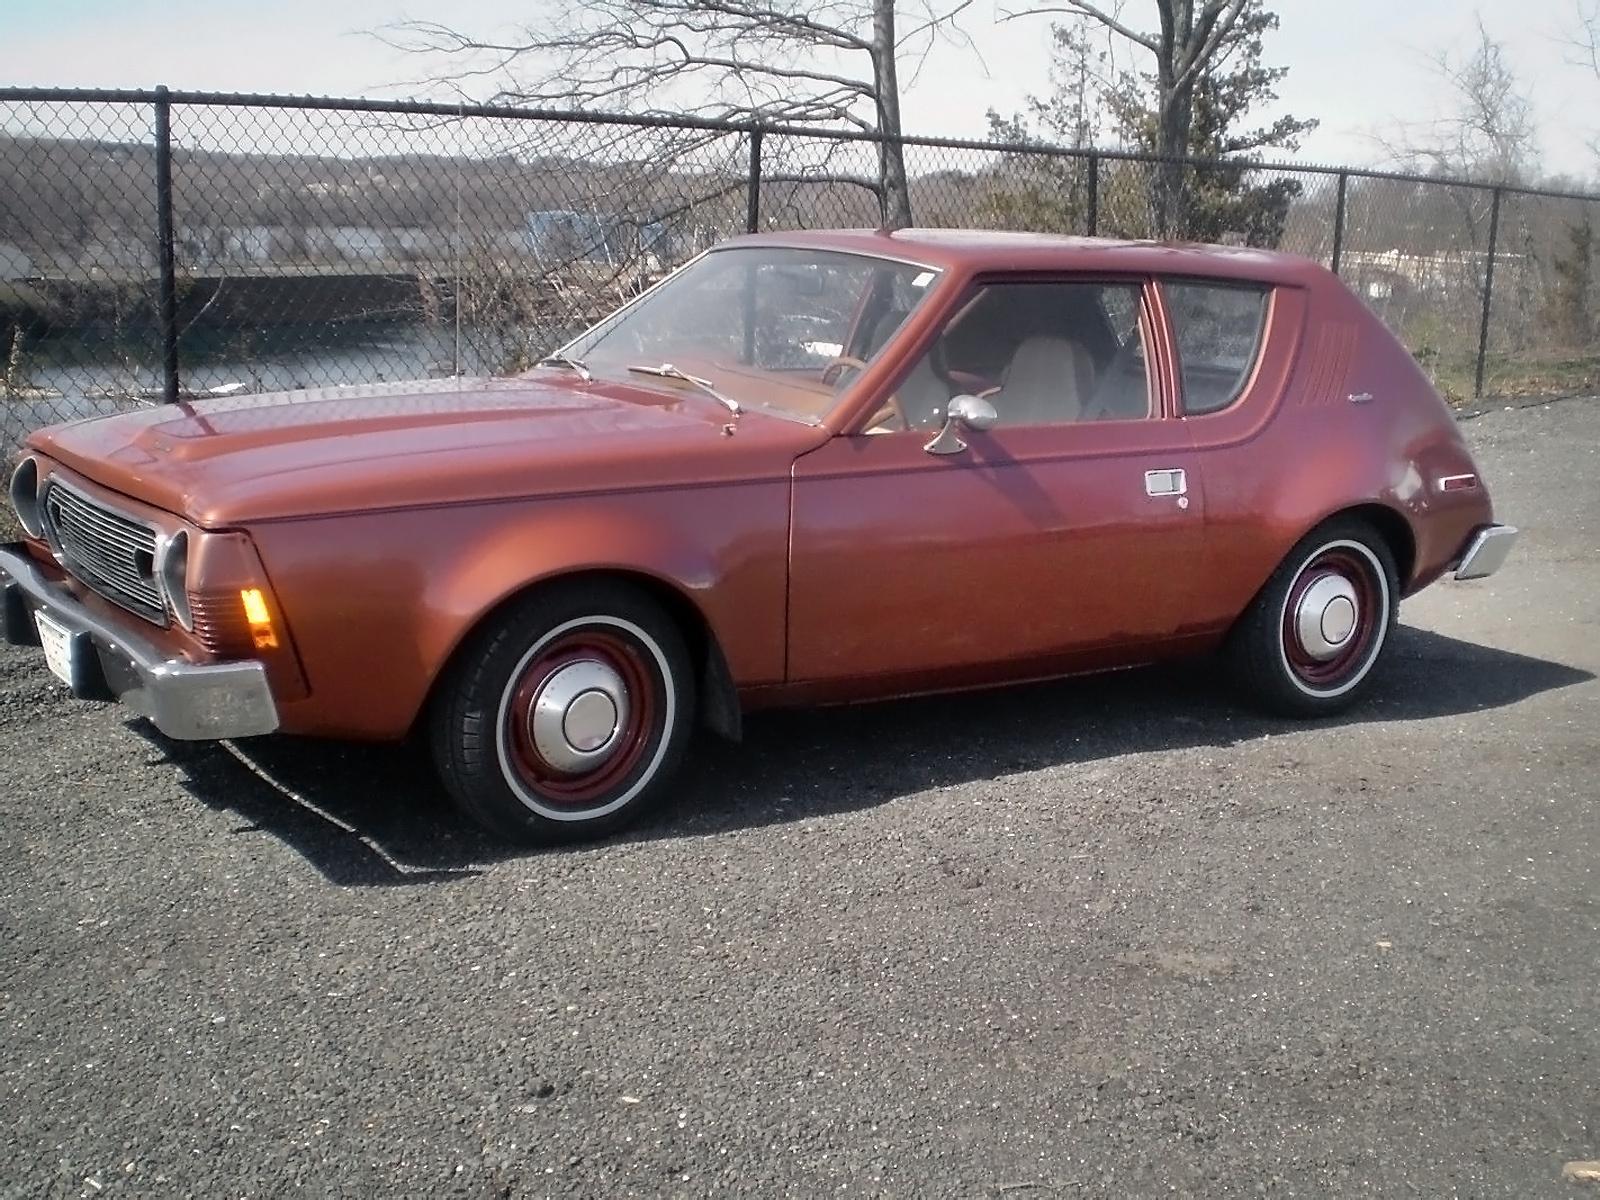 Cool Copper Colored Car: 1974 AMC Gremlin